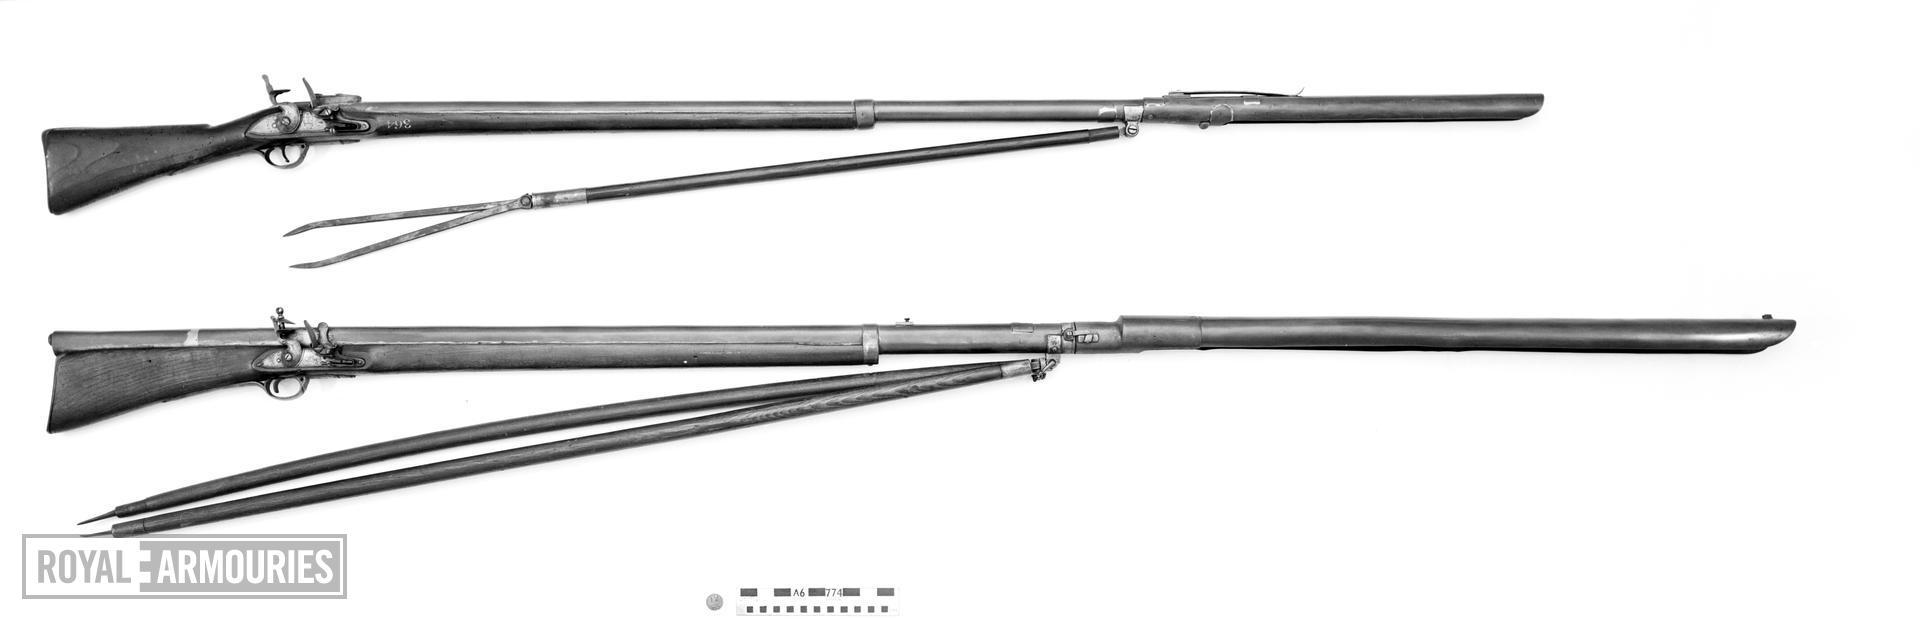 Flintlock rocket launcher - Unknown